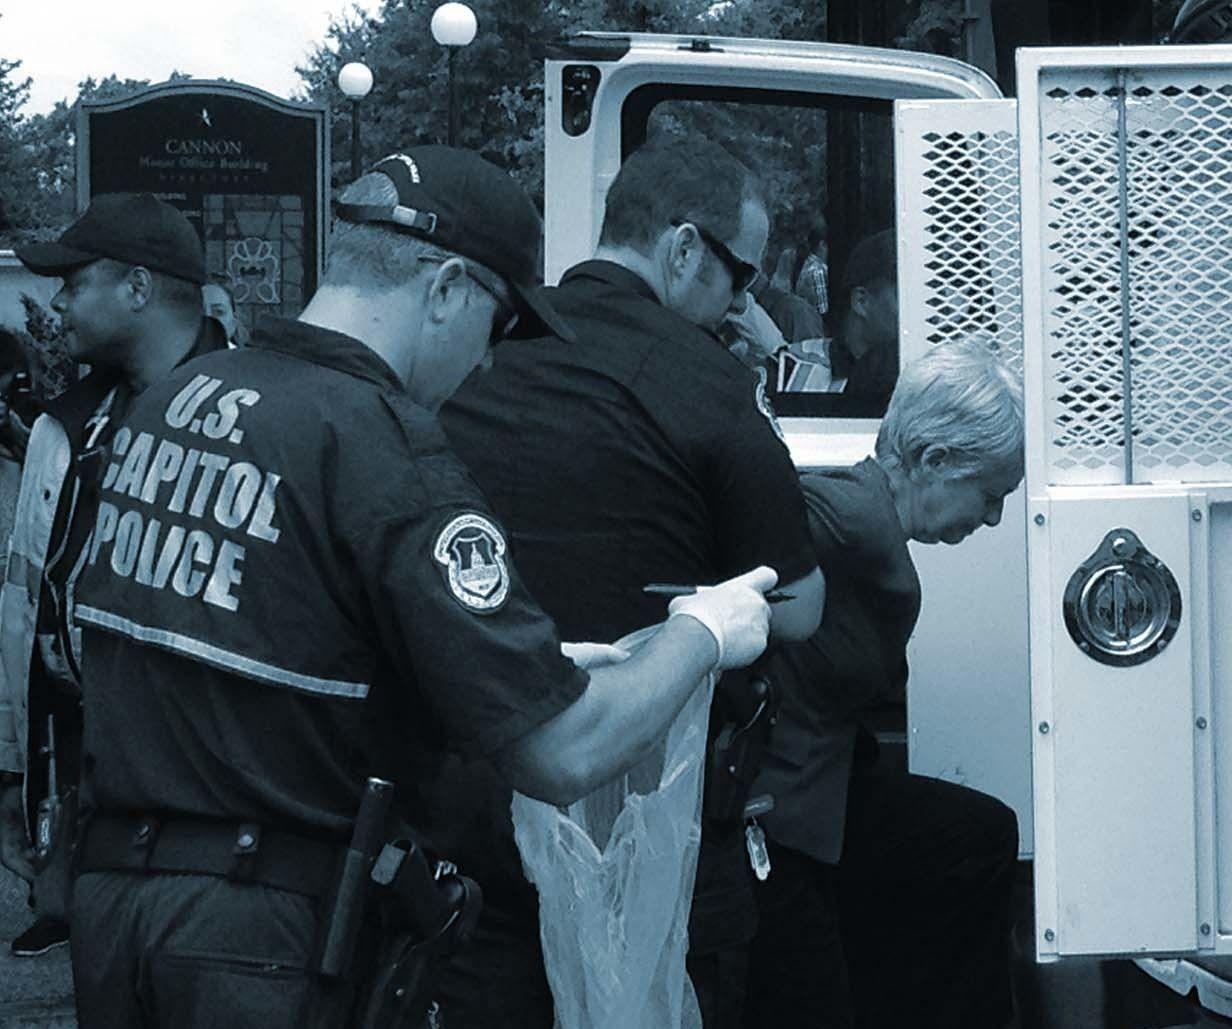 2010 Heather Immigration arrest